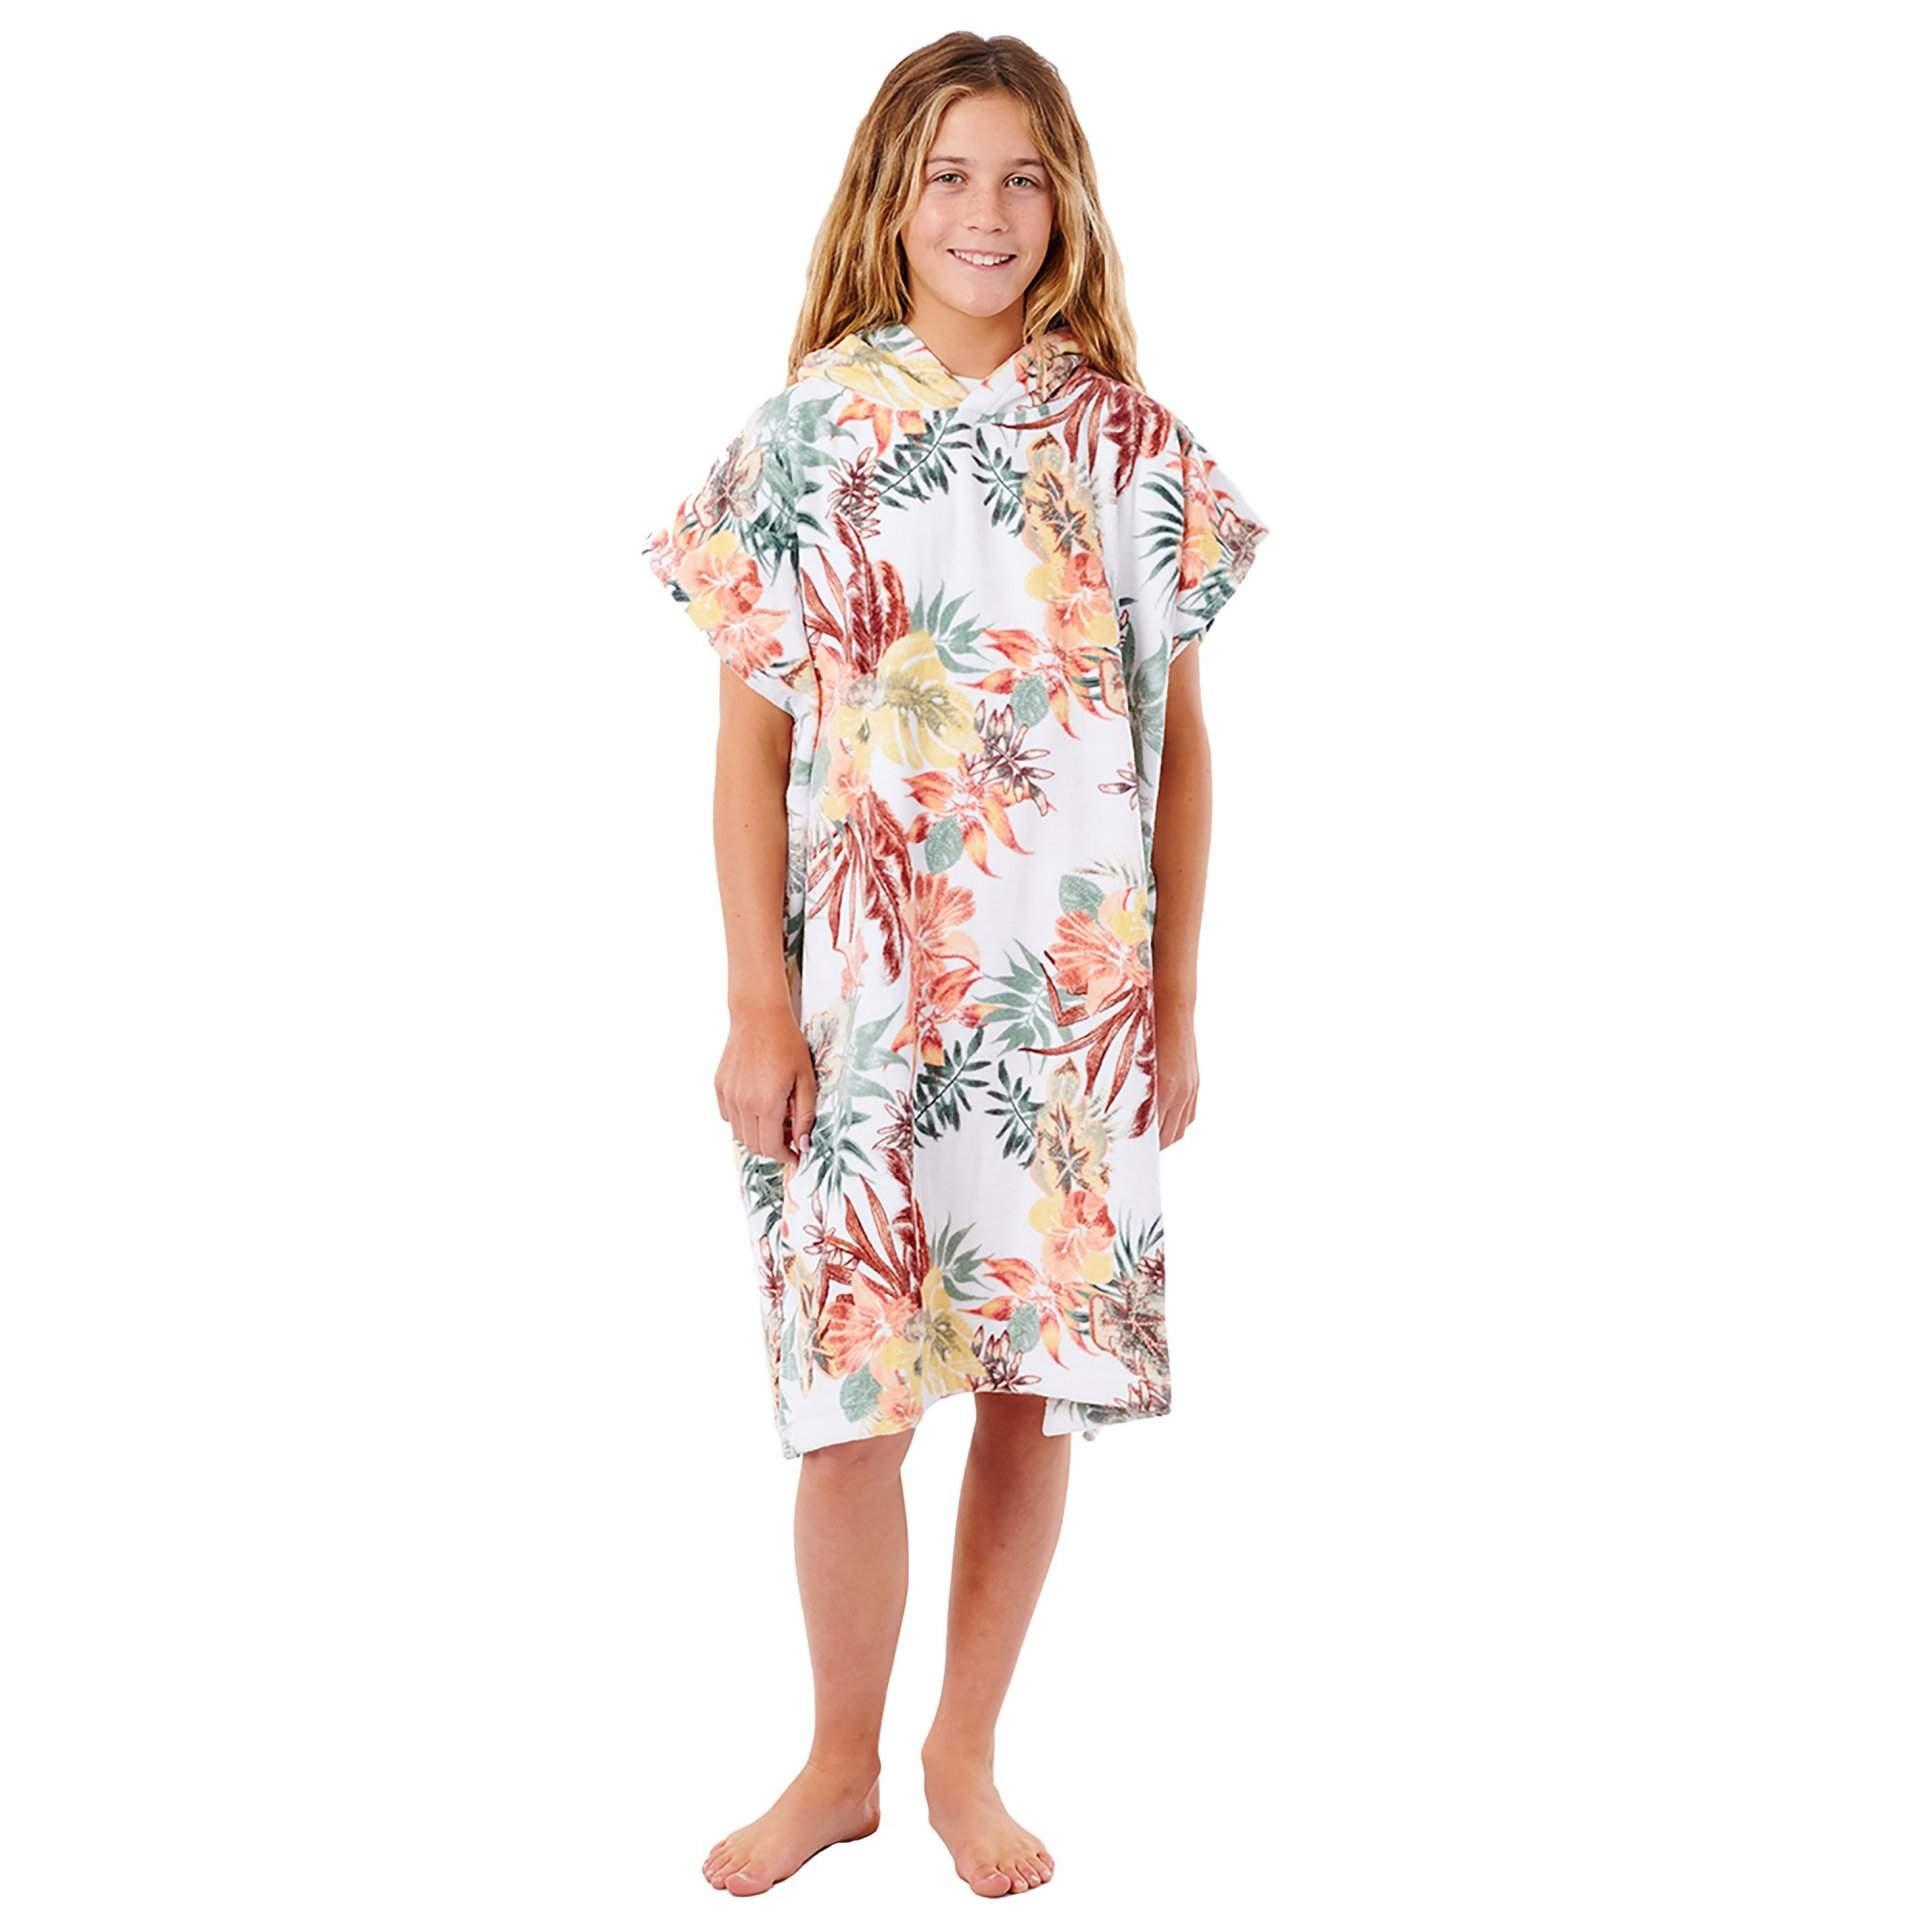 PONCHO RĘCZNIK RIP CURL TALLOWS HOOD TOWEL GIRL JTWAG1 1000 WHITE